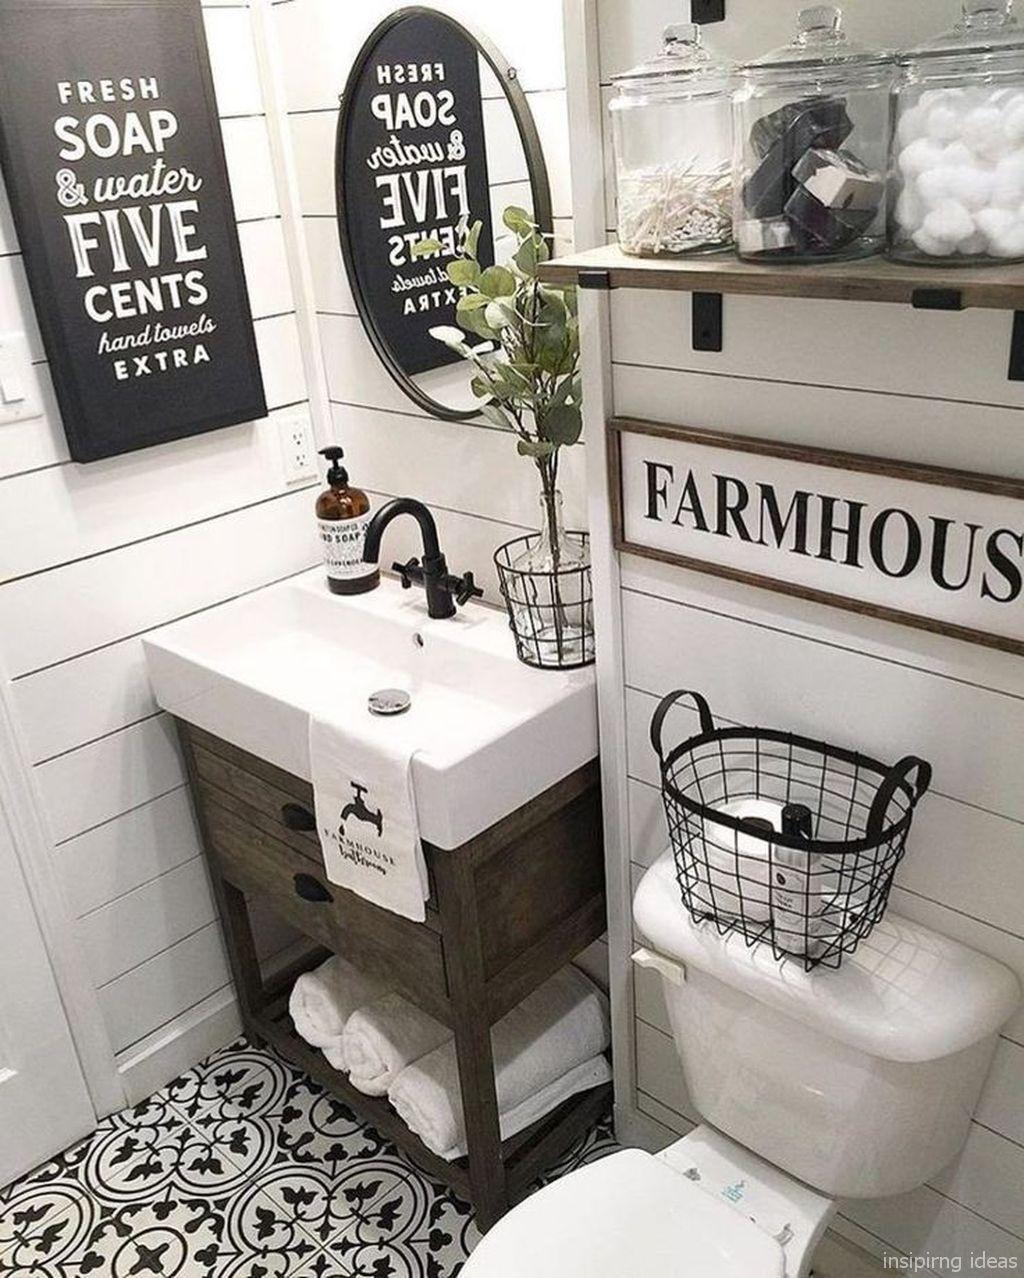 Awesome 67 Incredible Modern Farmhouse Bathroom Tile Ideas Https Lovelyving Com Modern Farmhouse Bathroom Farmhouse Bathroom Decor Farmhouse Master Bathroom